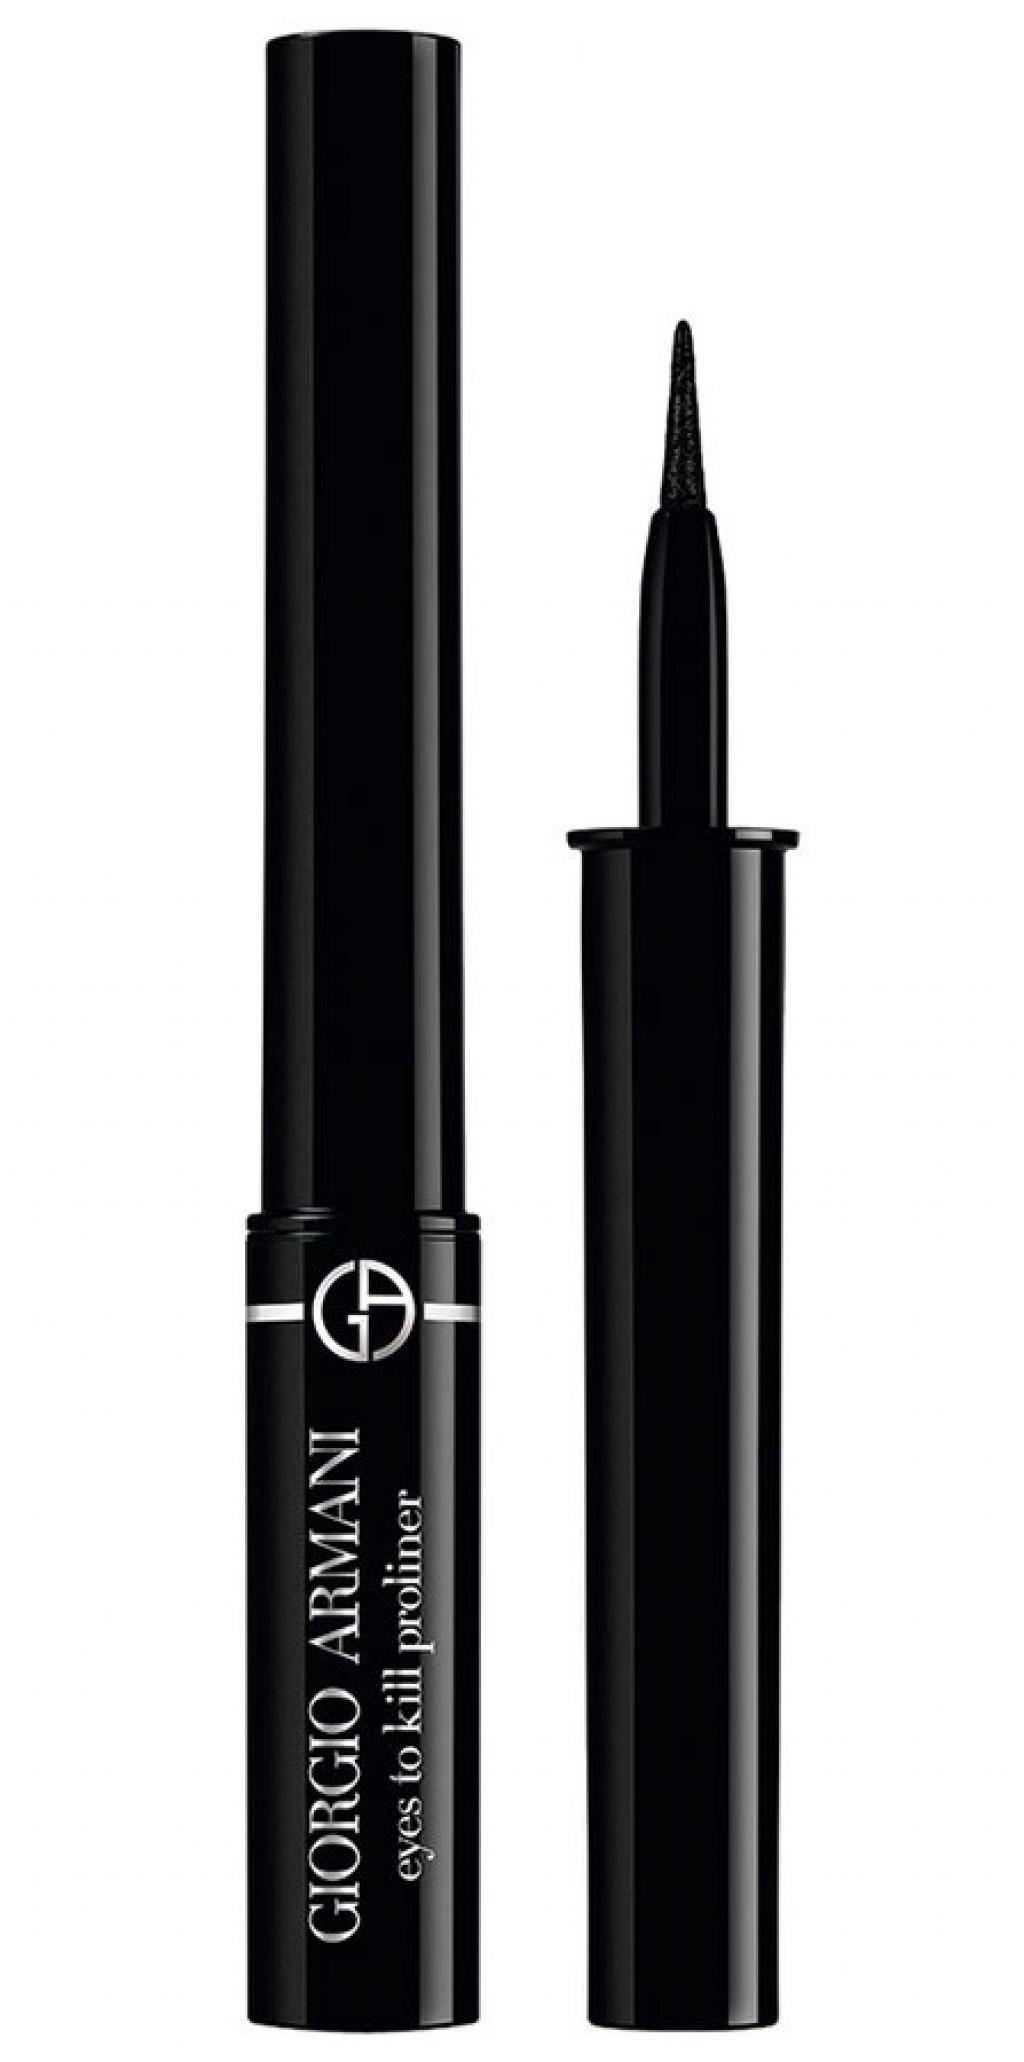 giorgio armani eyes to kill proliner makeup beautyalmanac. Black Bedroom Furniture Sets. Home Design Ideas